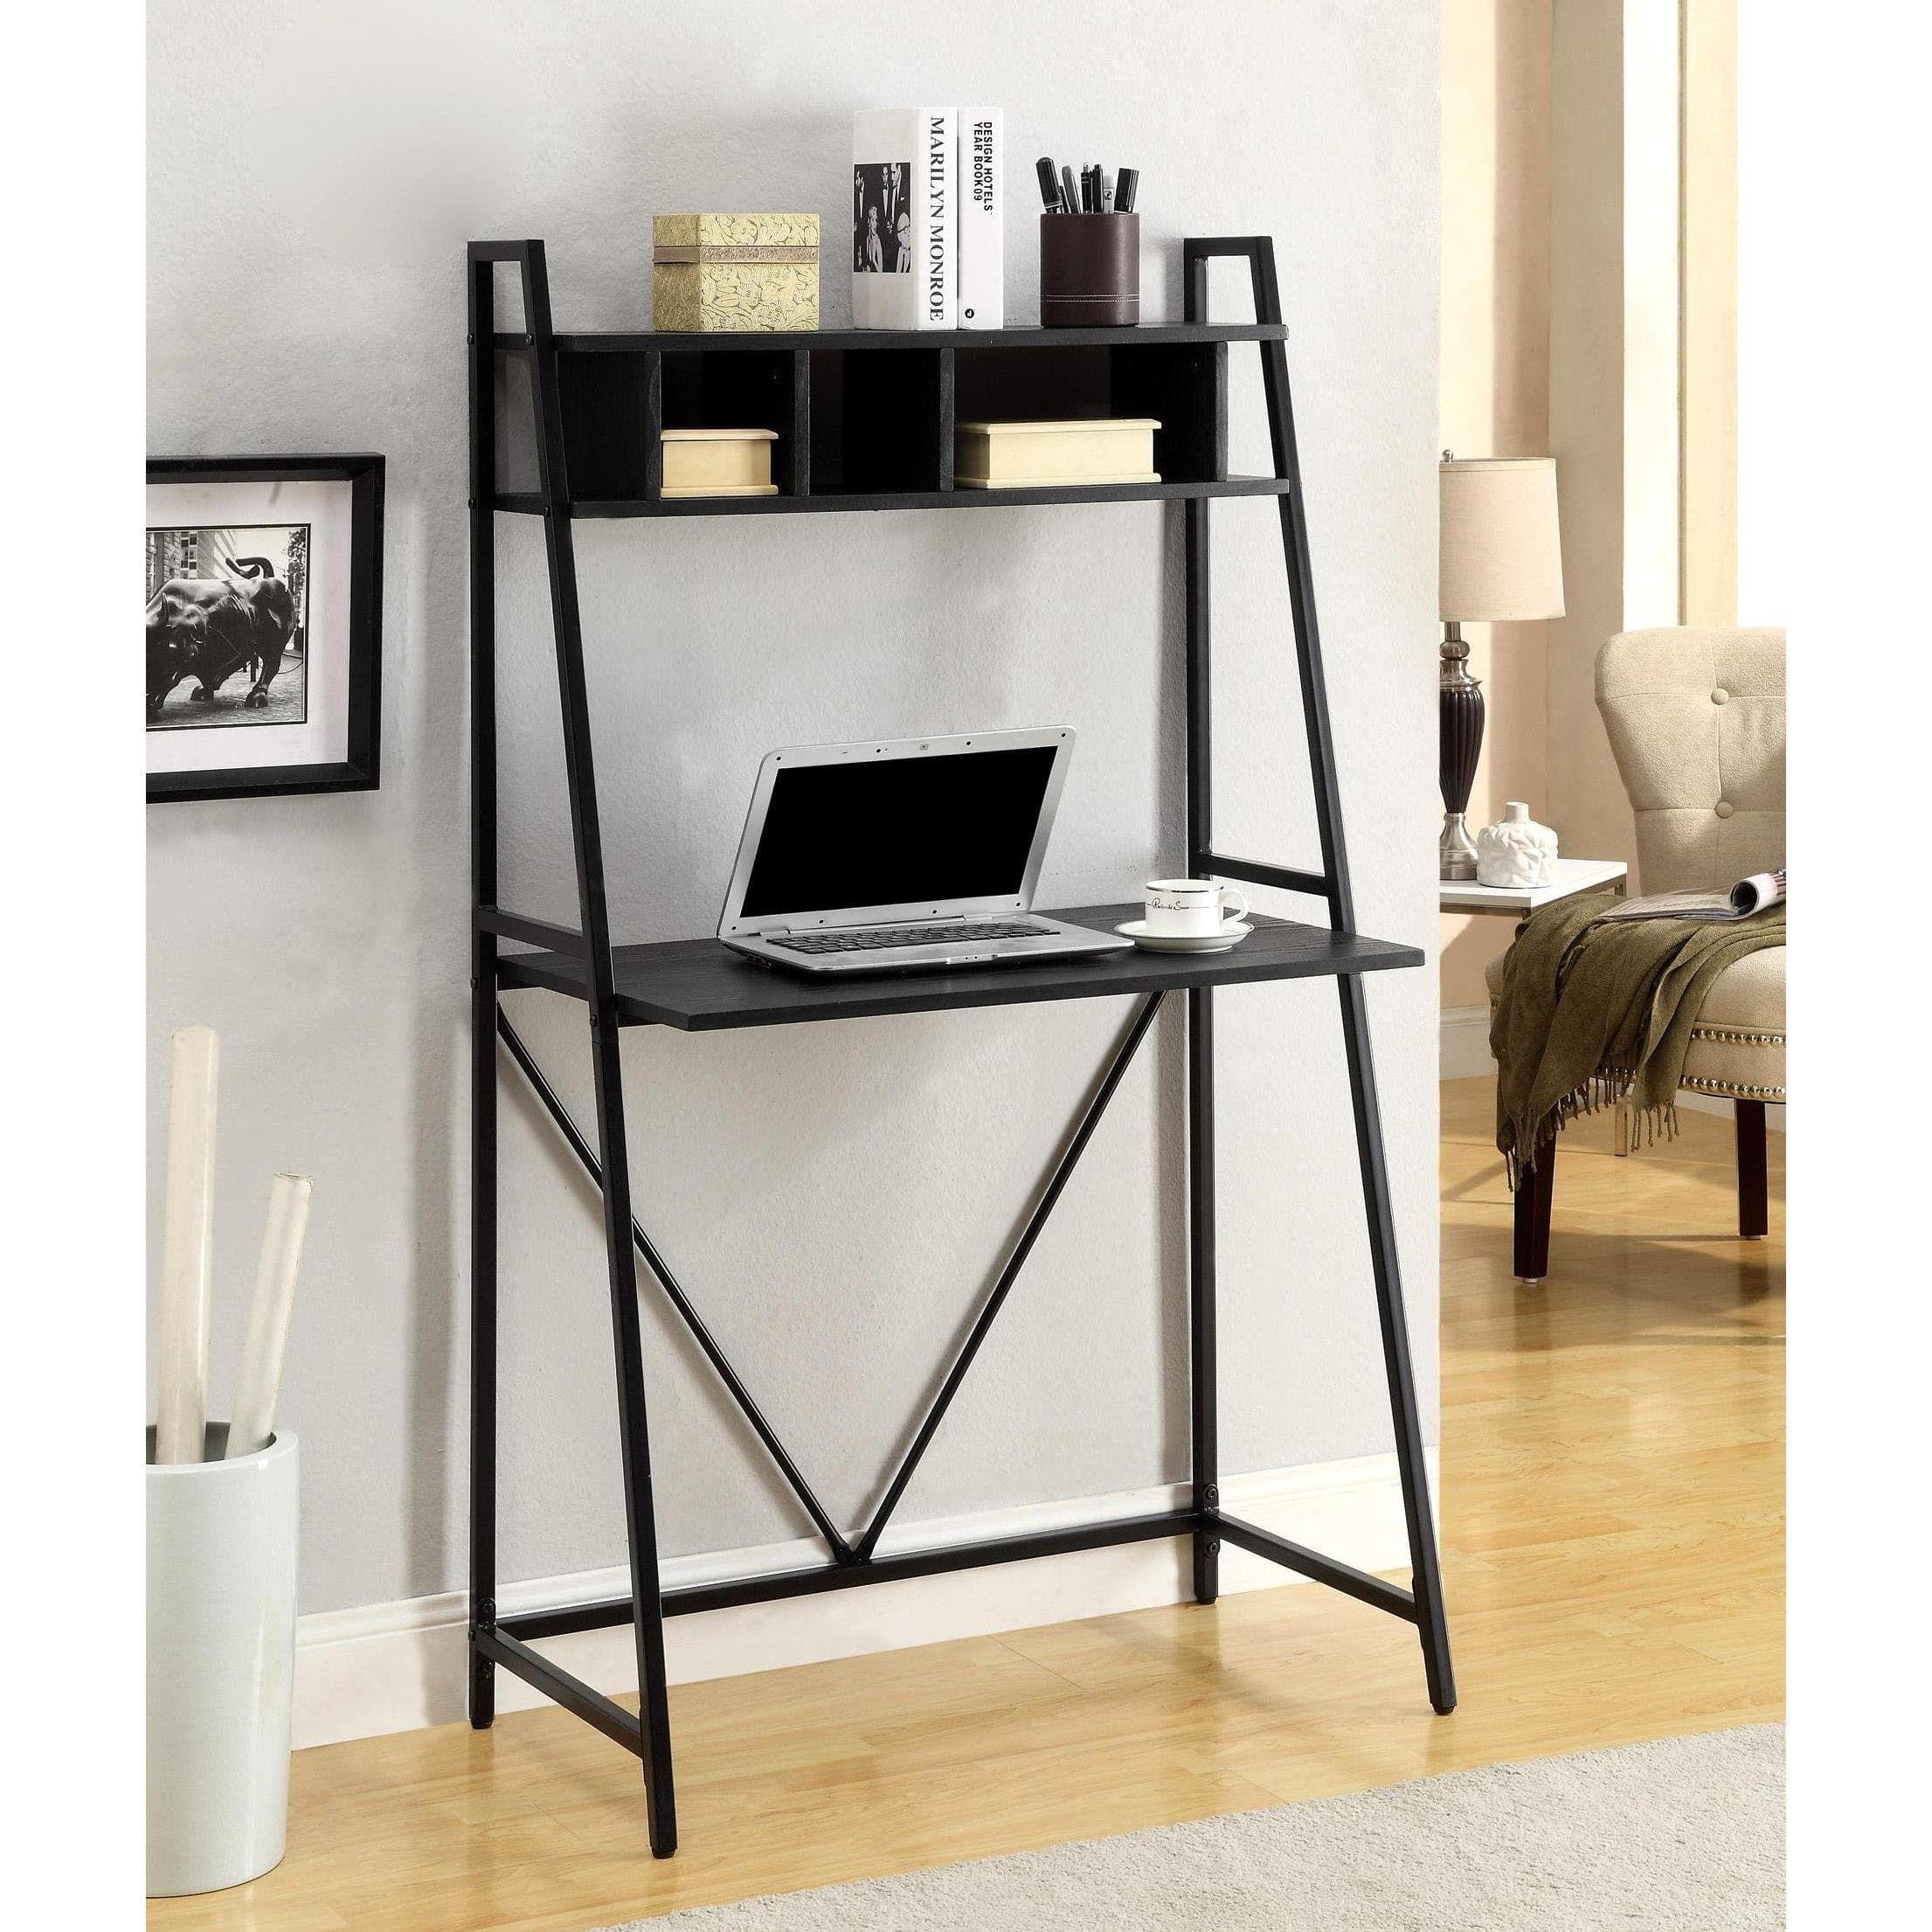 Transitional style writing desk with storage shelf black